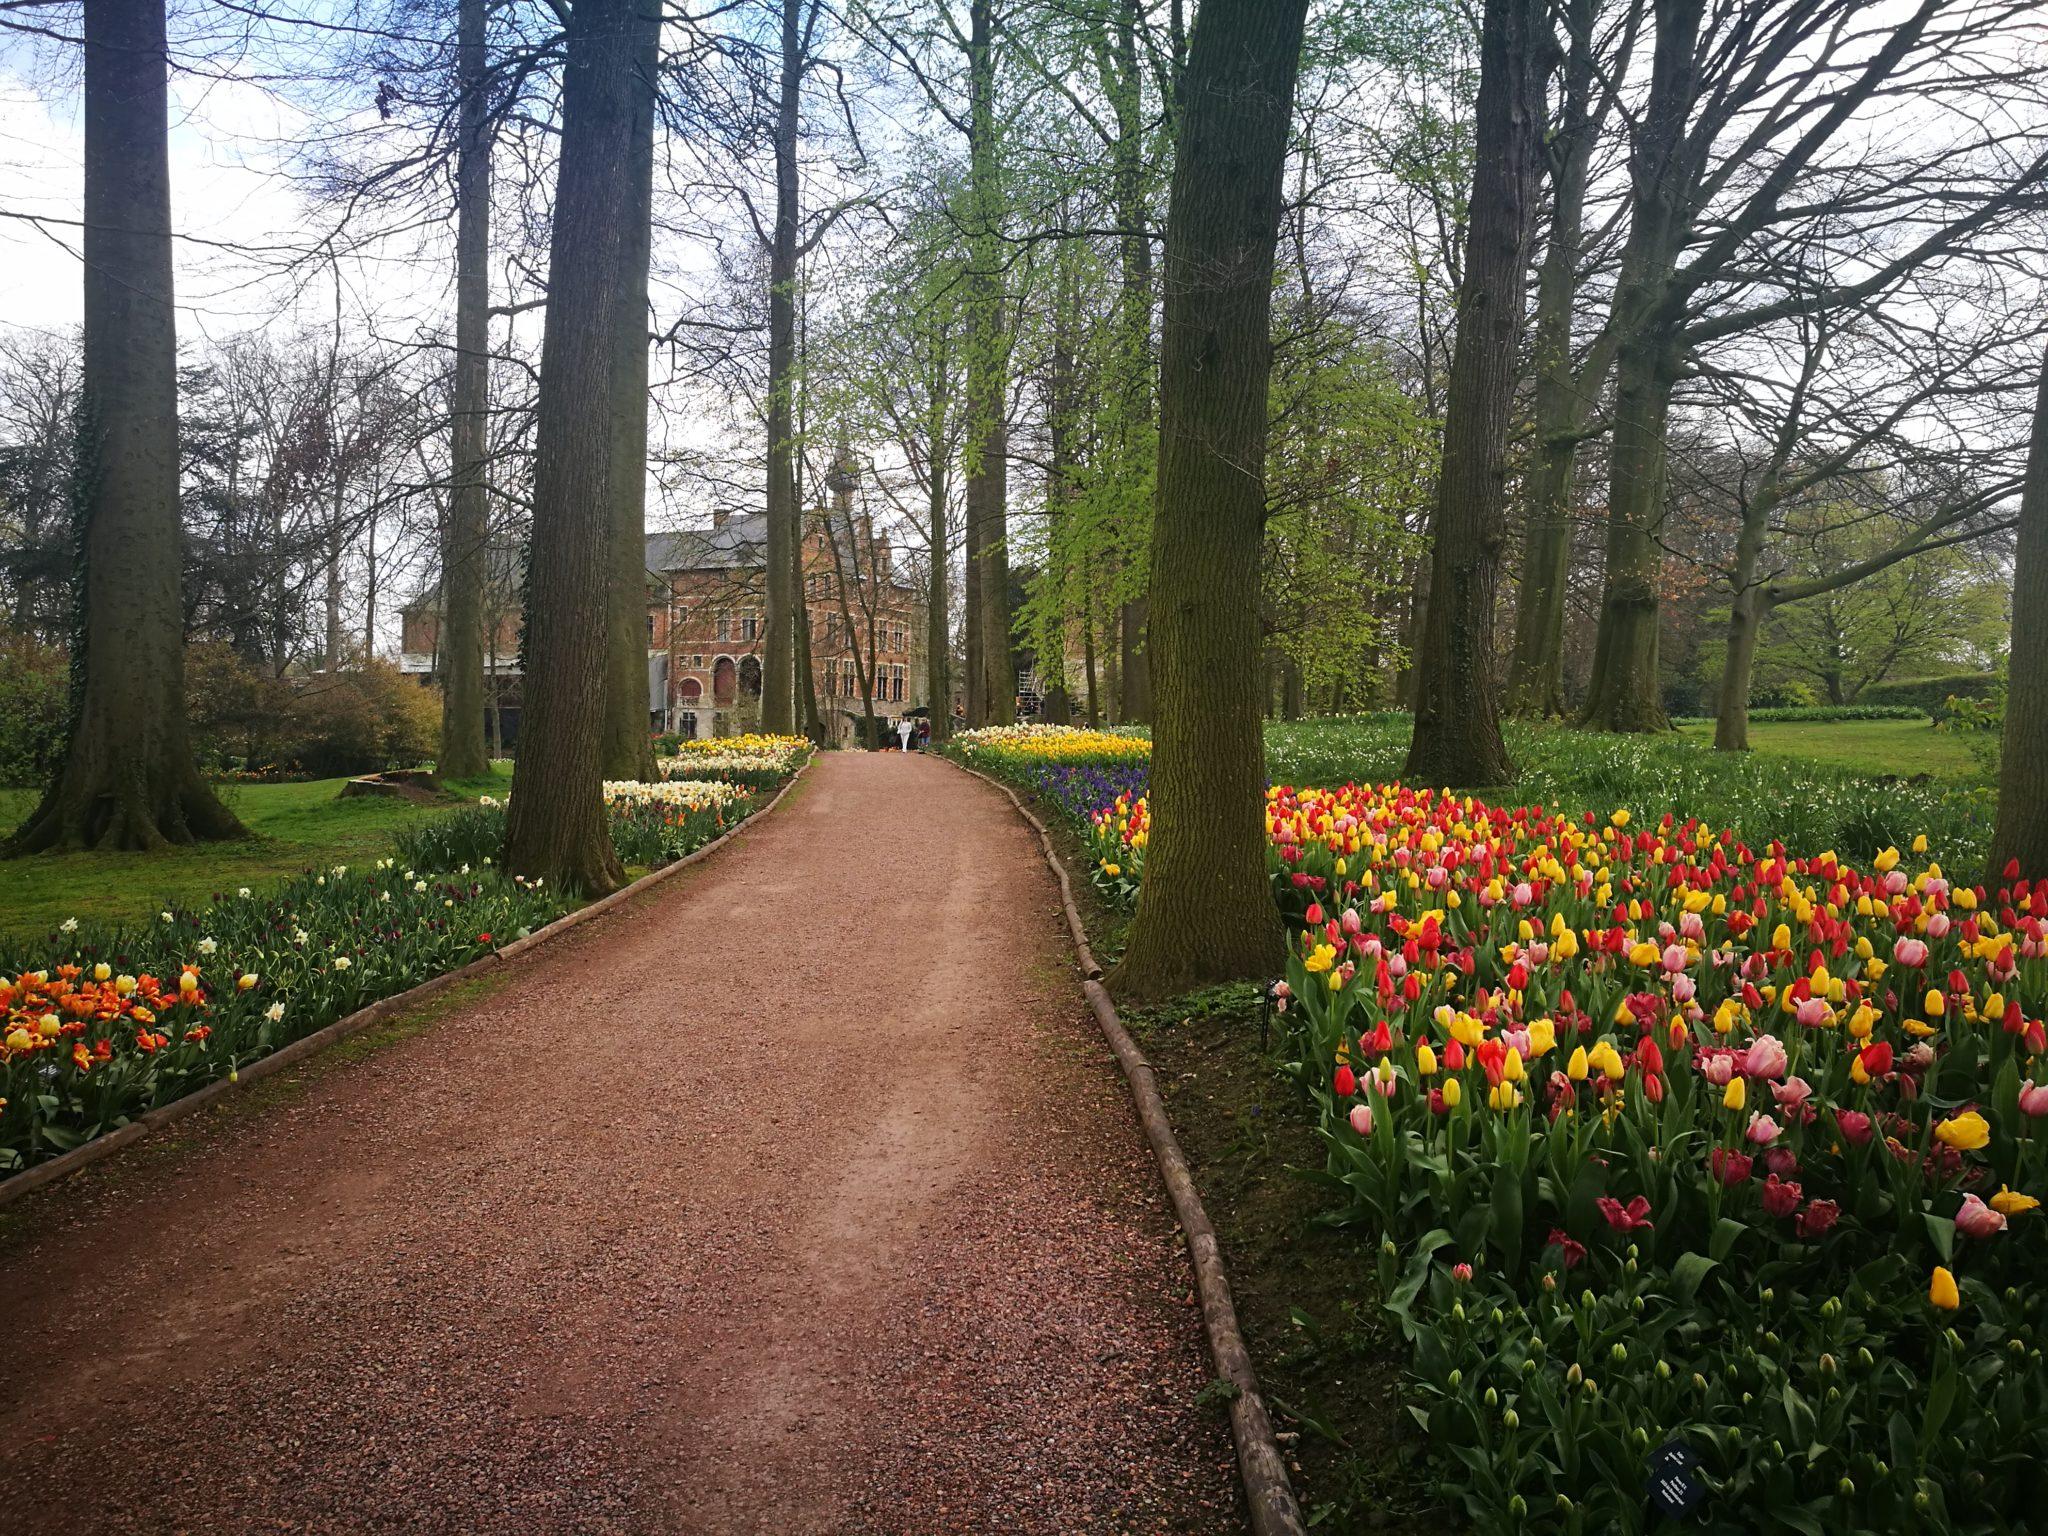 Ogród zamkowy Groot-Bijgaarden